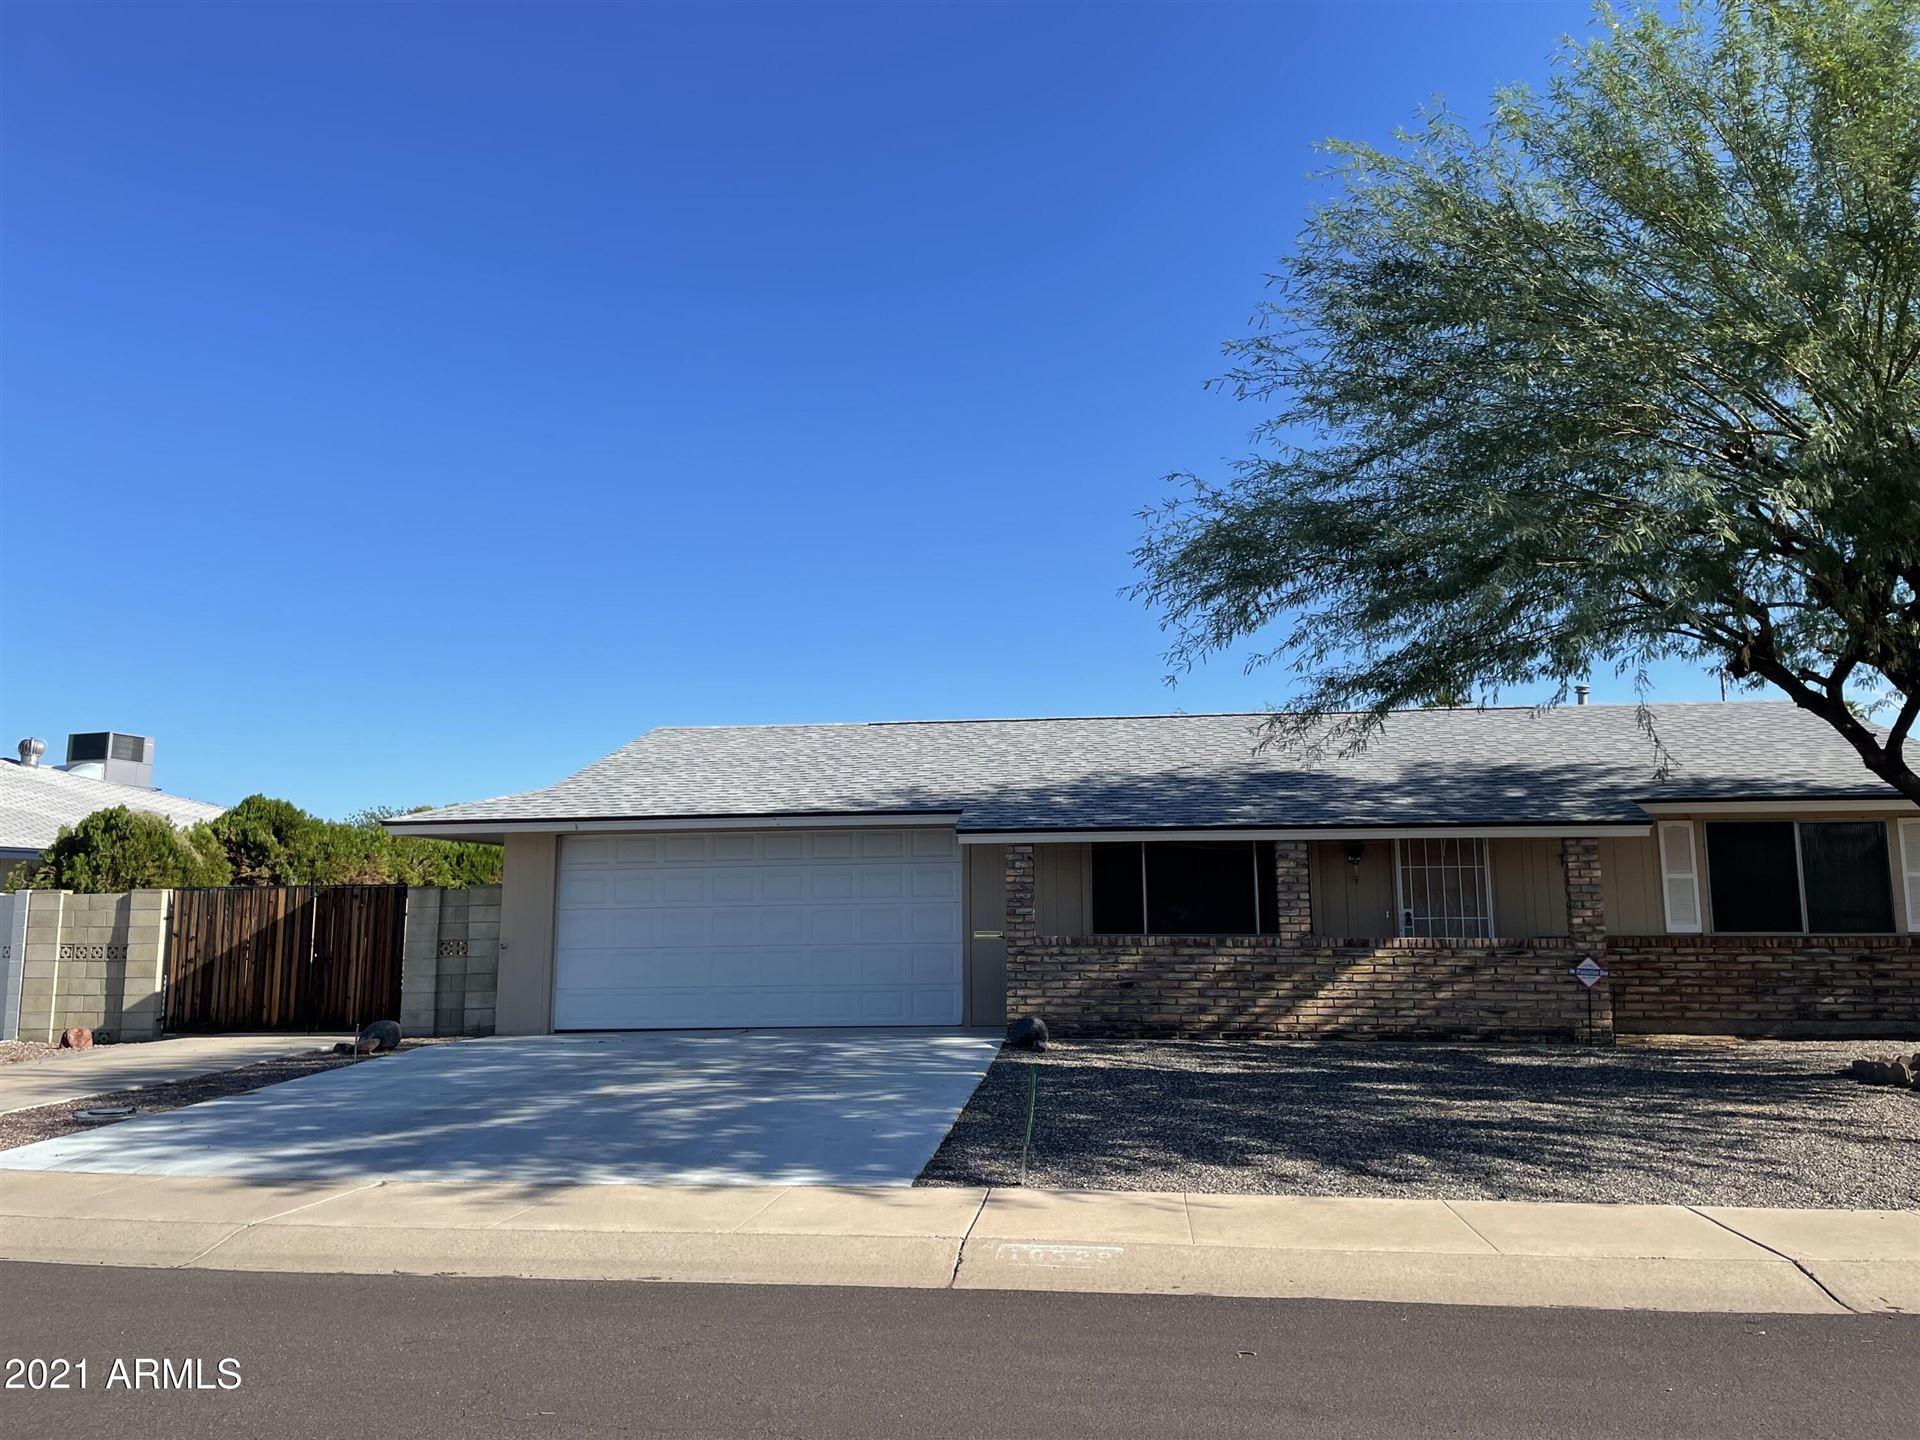 Photo of 10529 W BELLAROSE Drive, Sun City, AZ 85351 (MLS # 6306514)